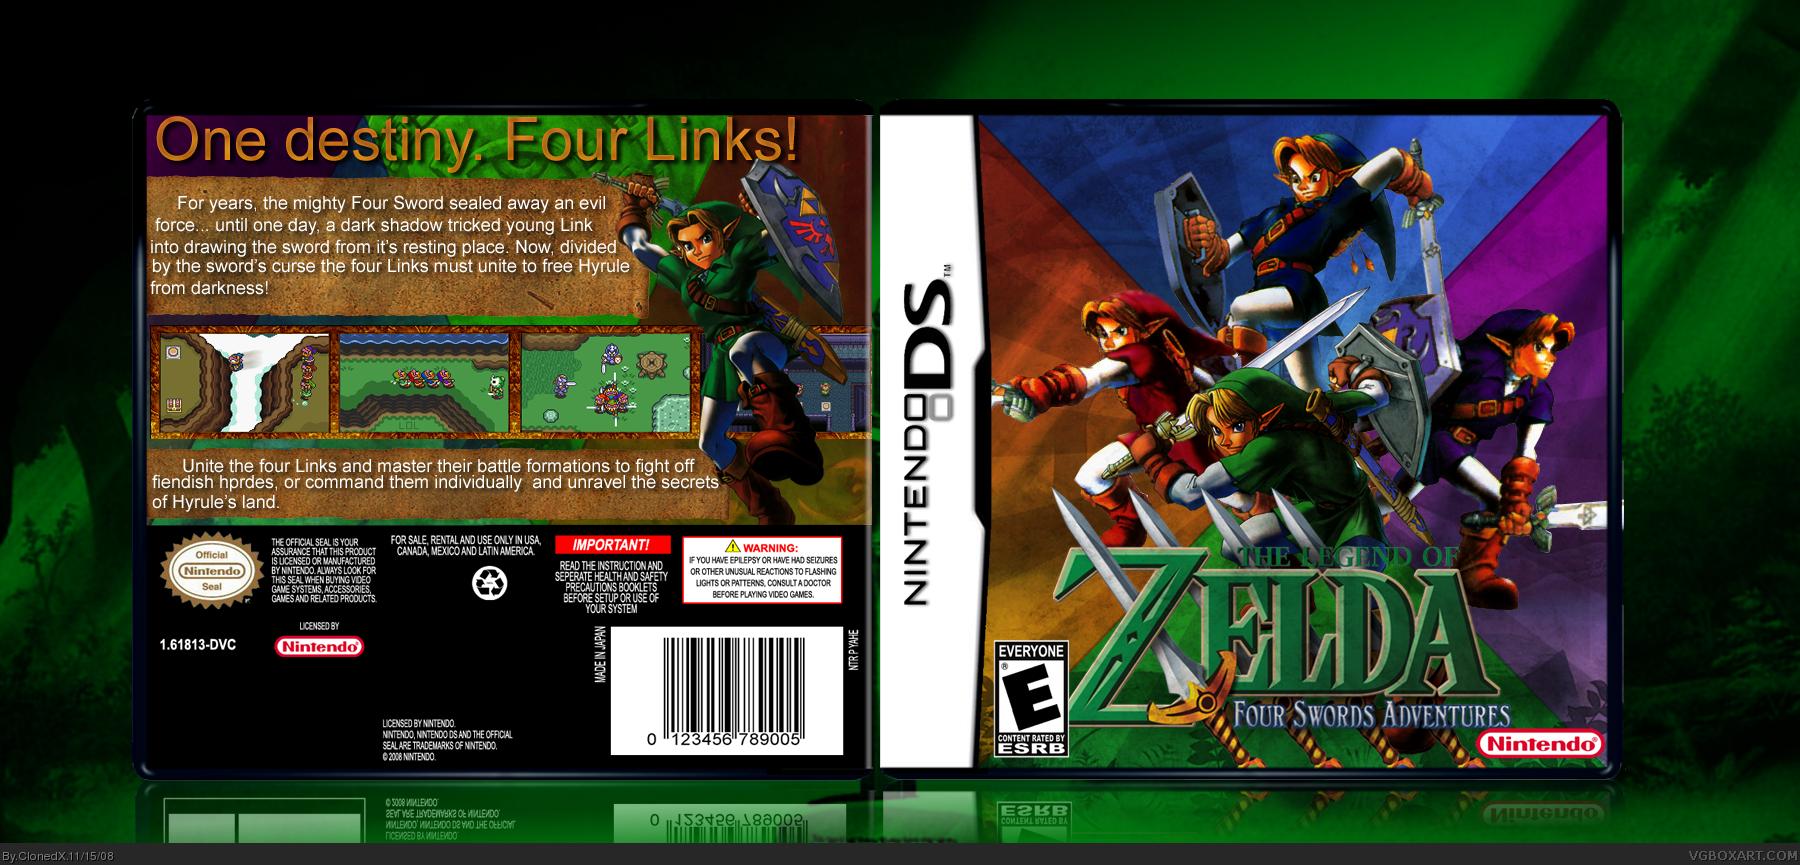 DS » The Legend of Zelda: Four Swords Adventures Box Cover